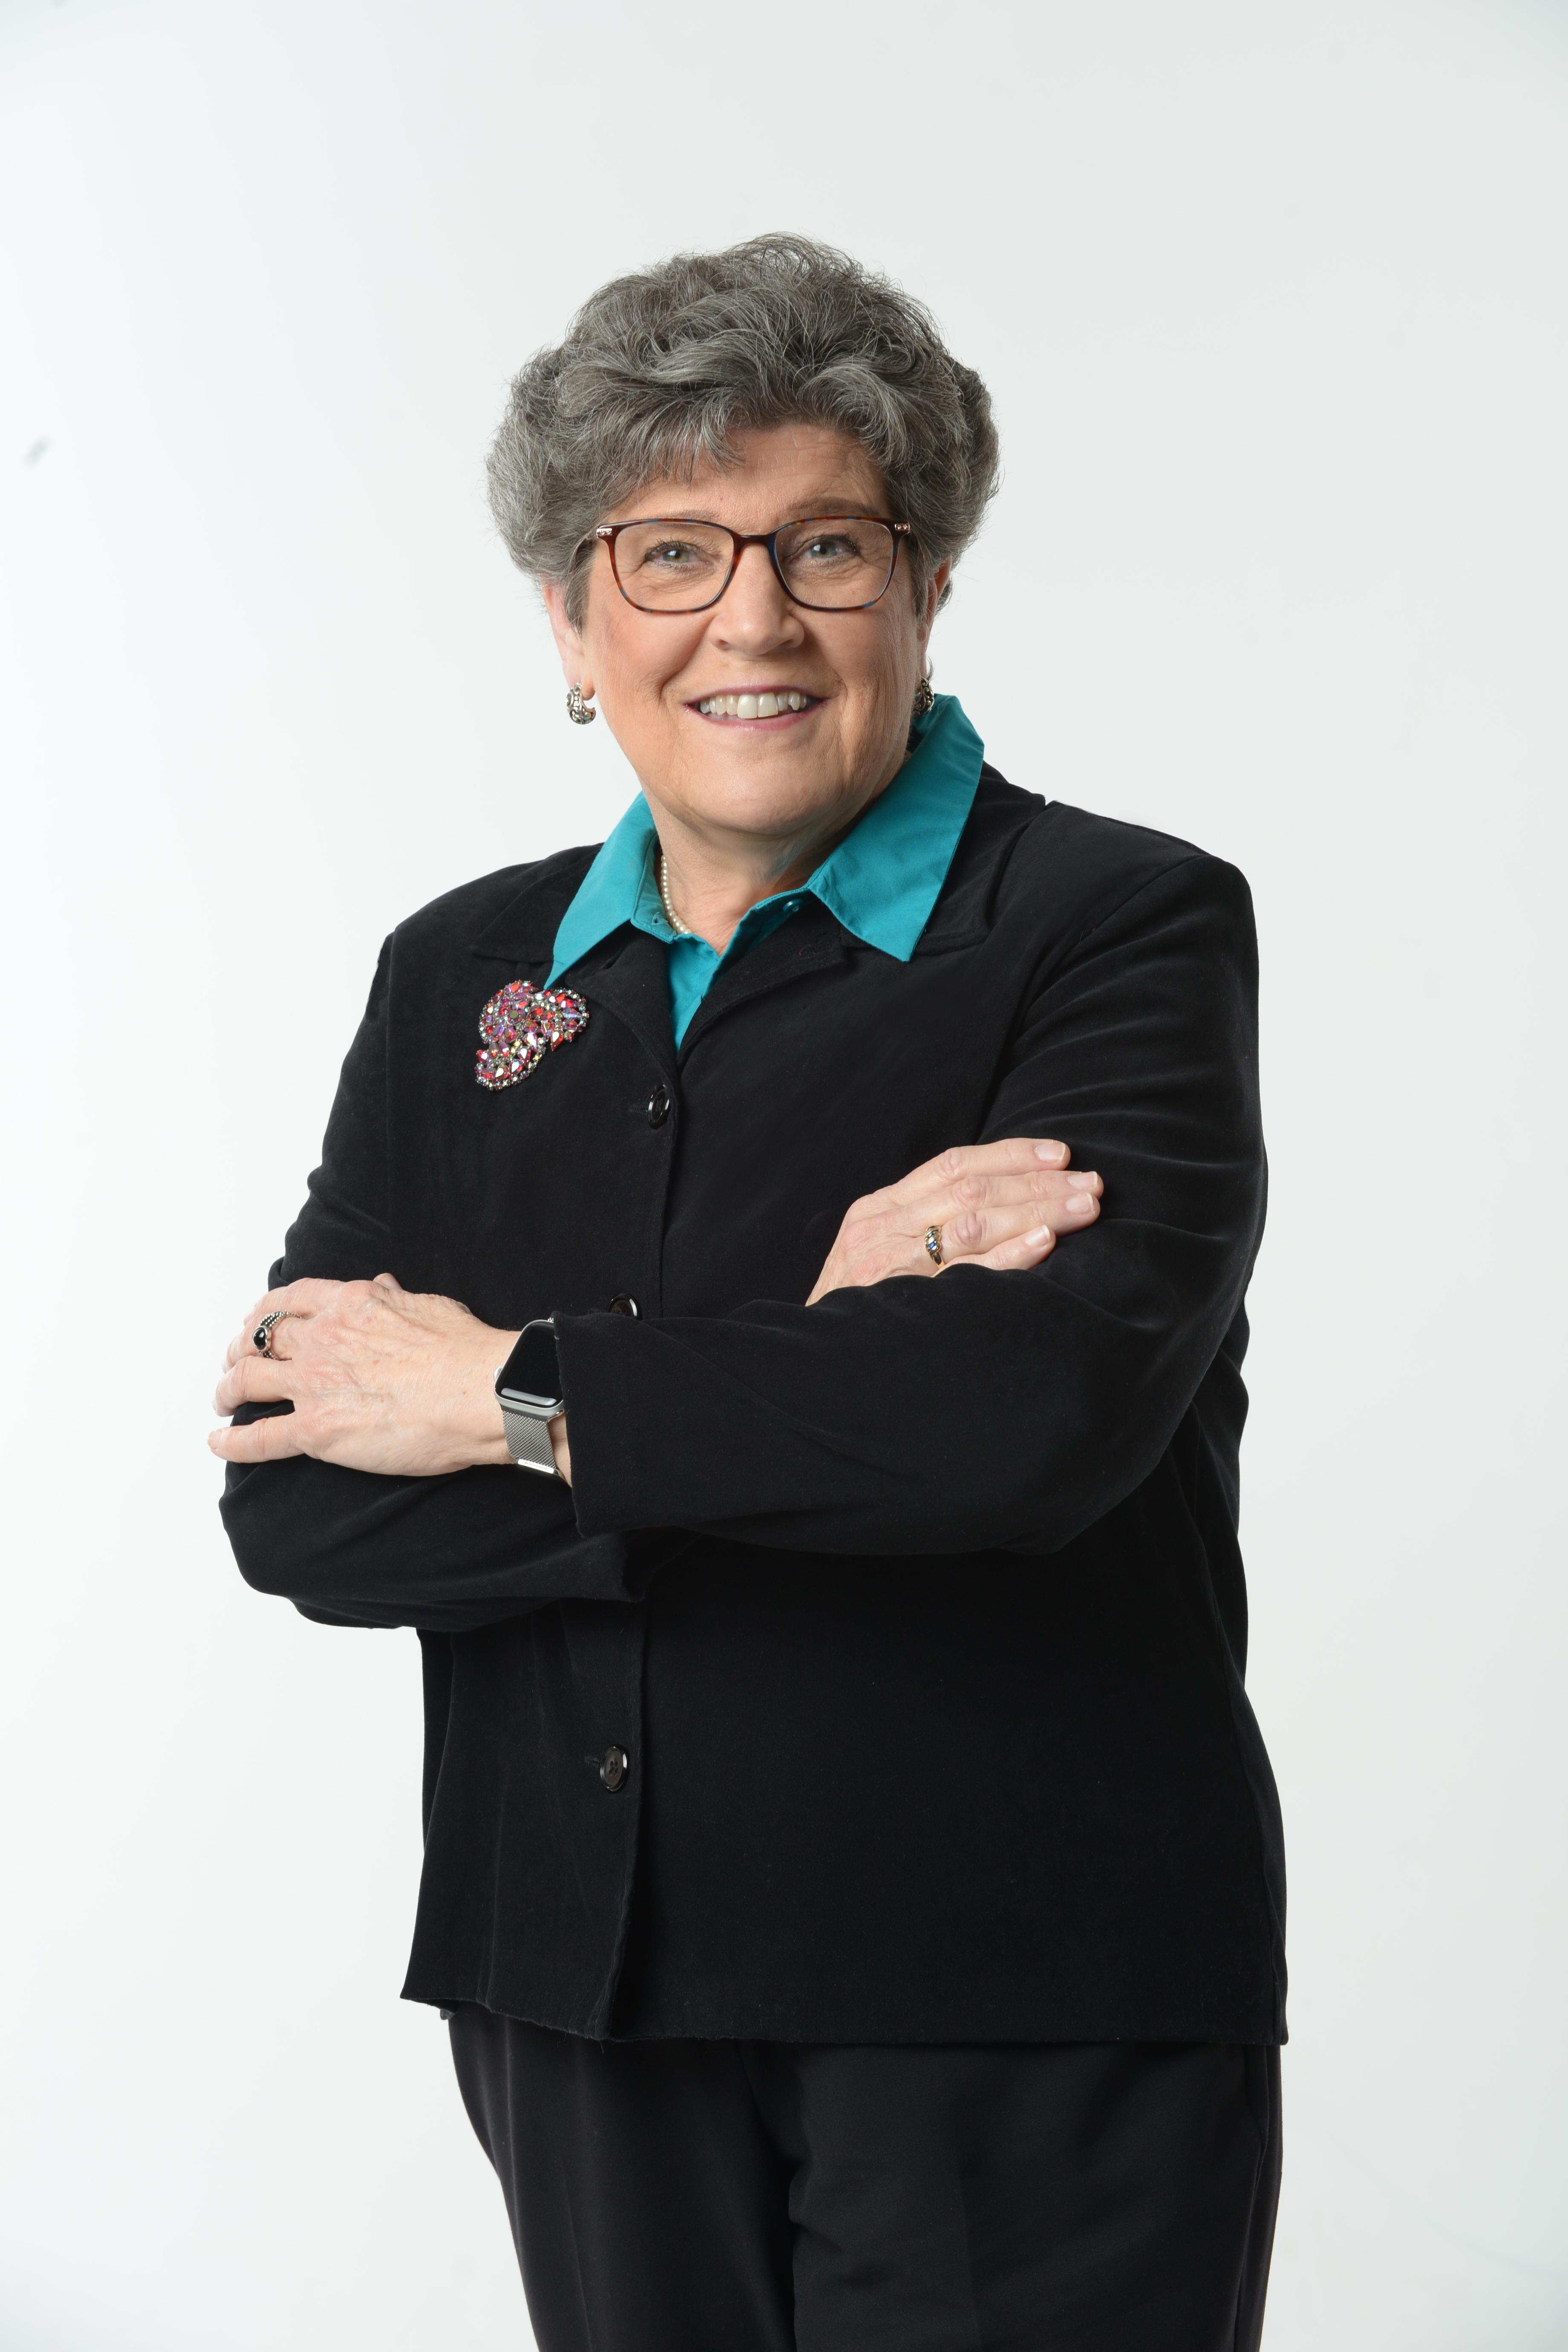 Anita Waldroup